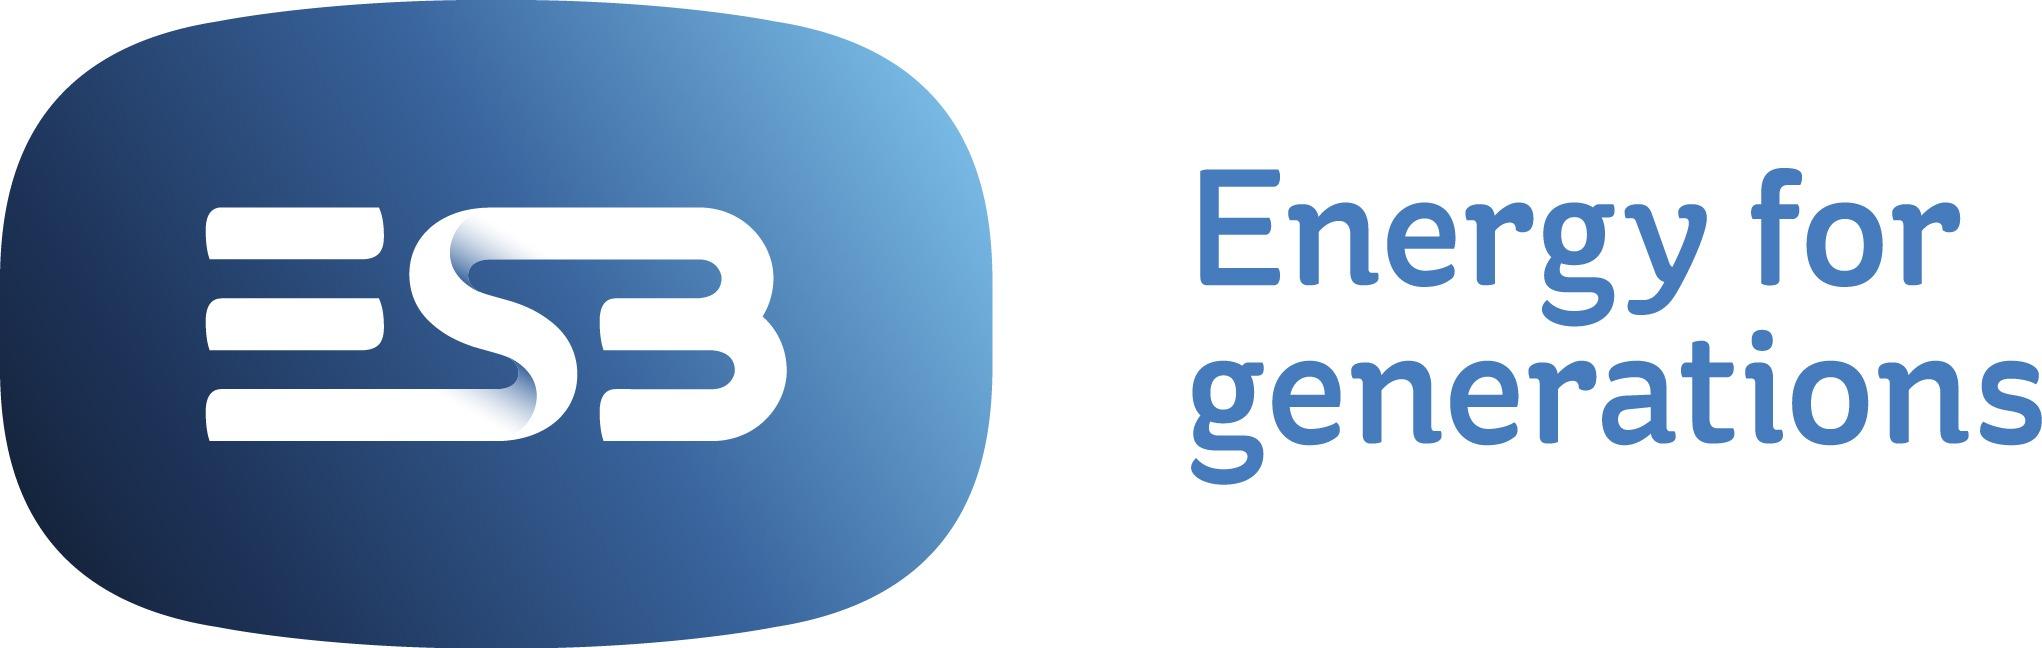 ESB brandmark strapline